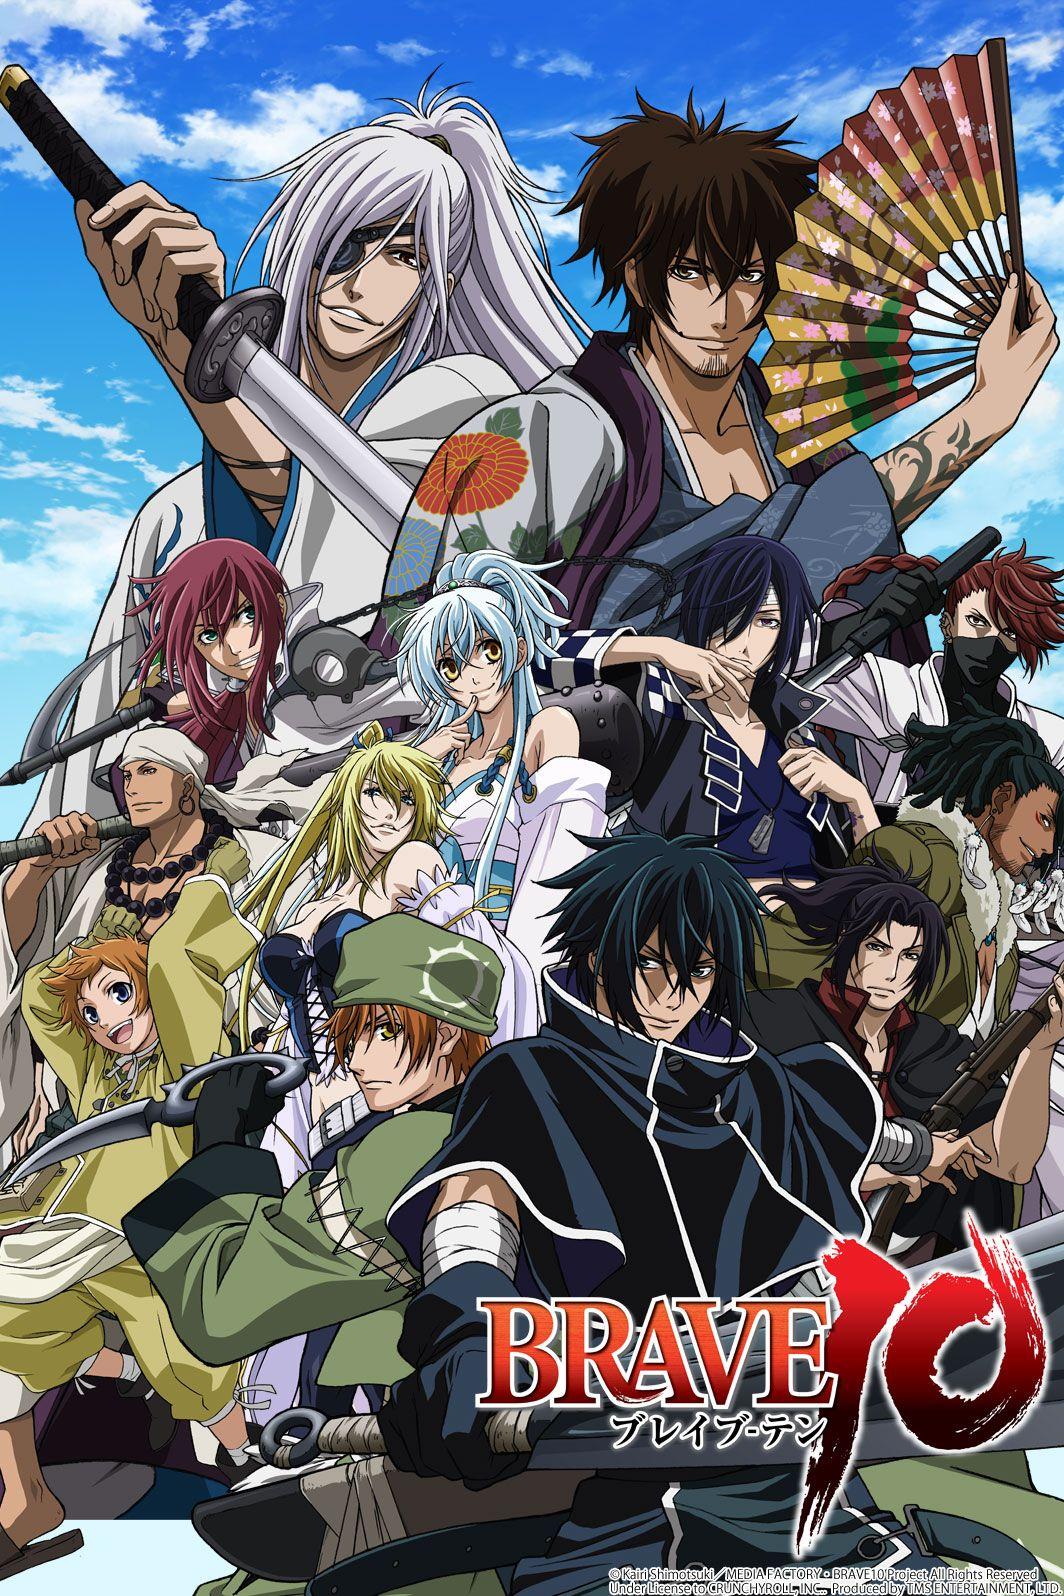 """Десятка храбрецов"" Алое отчаяние Anime, Popular anime"